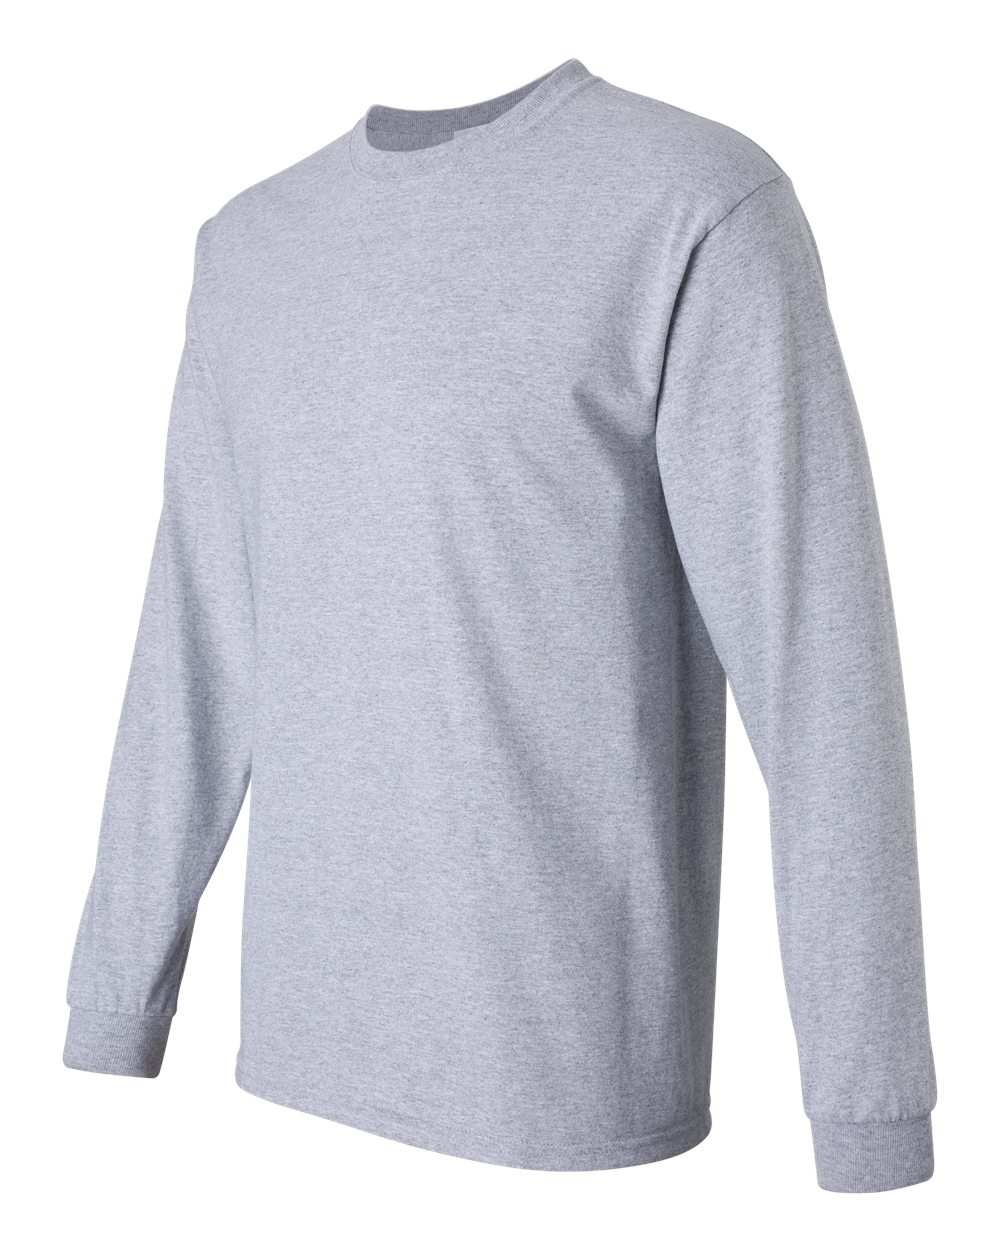 Gildan-Men-039-s-Ultra-Cotton-6-oz-Long-Sleeve-T-Shirt-G240-S-5XL thumbnail 103